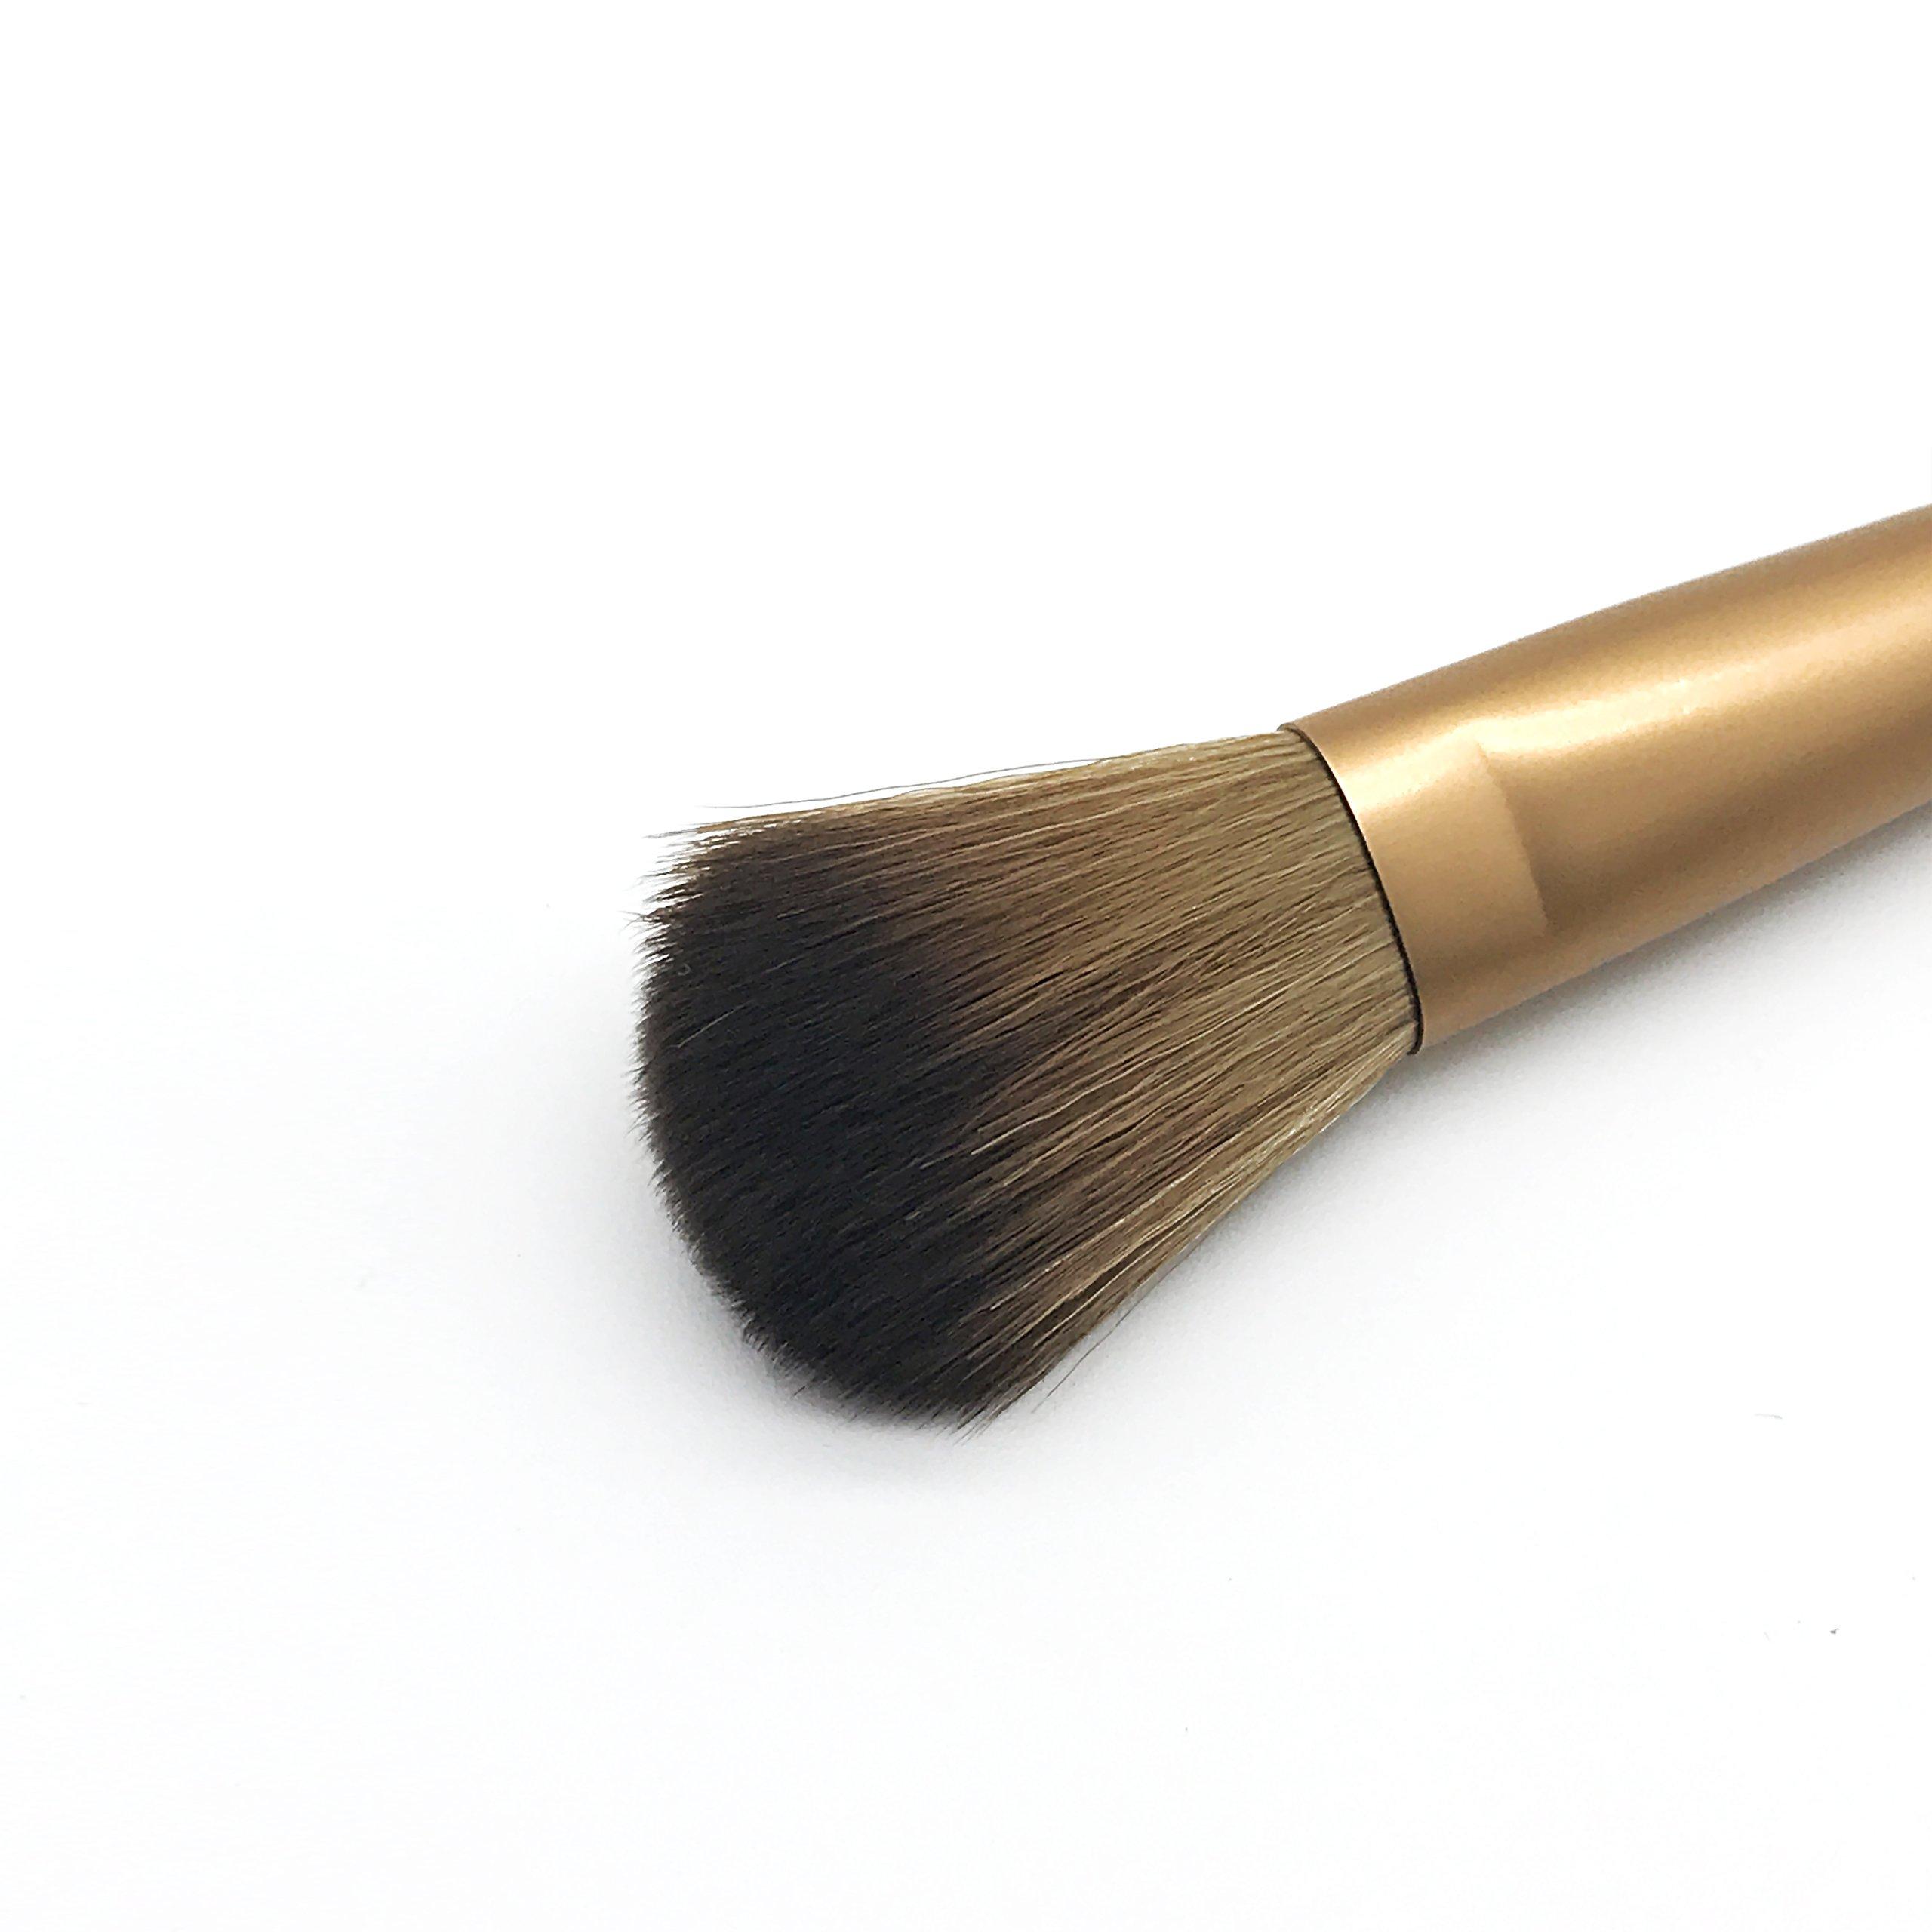 YoTruth 8 pcs Premium Comestic Brushes set Foundation Blending Blush Eyeliner Face Powder Brush Soft Comfortable Skin-friendly with PU Leather Bag (Silver)